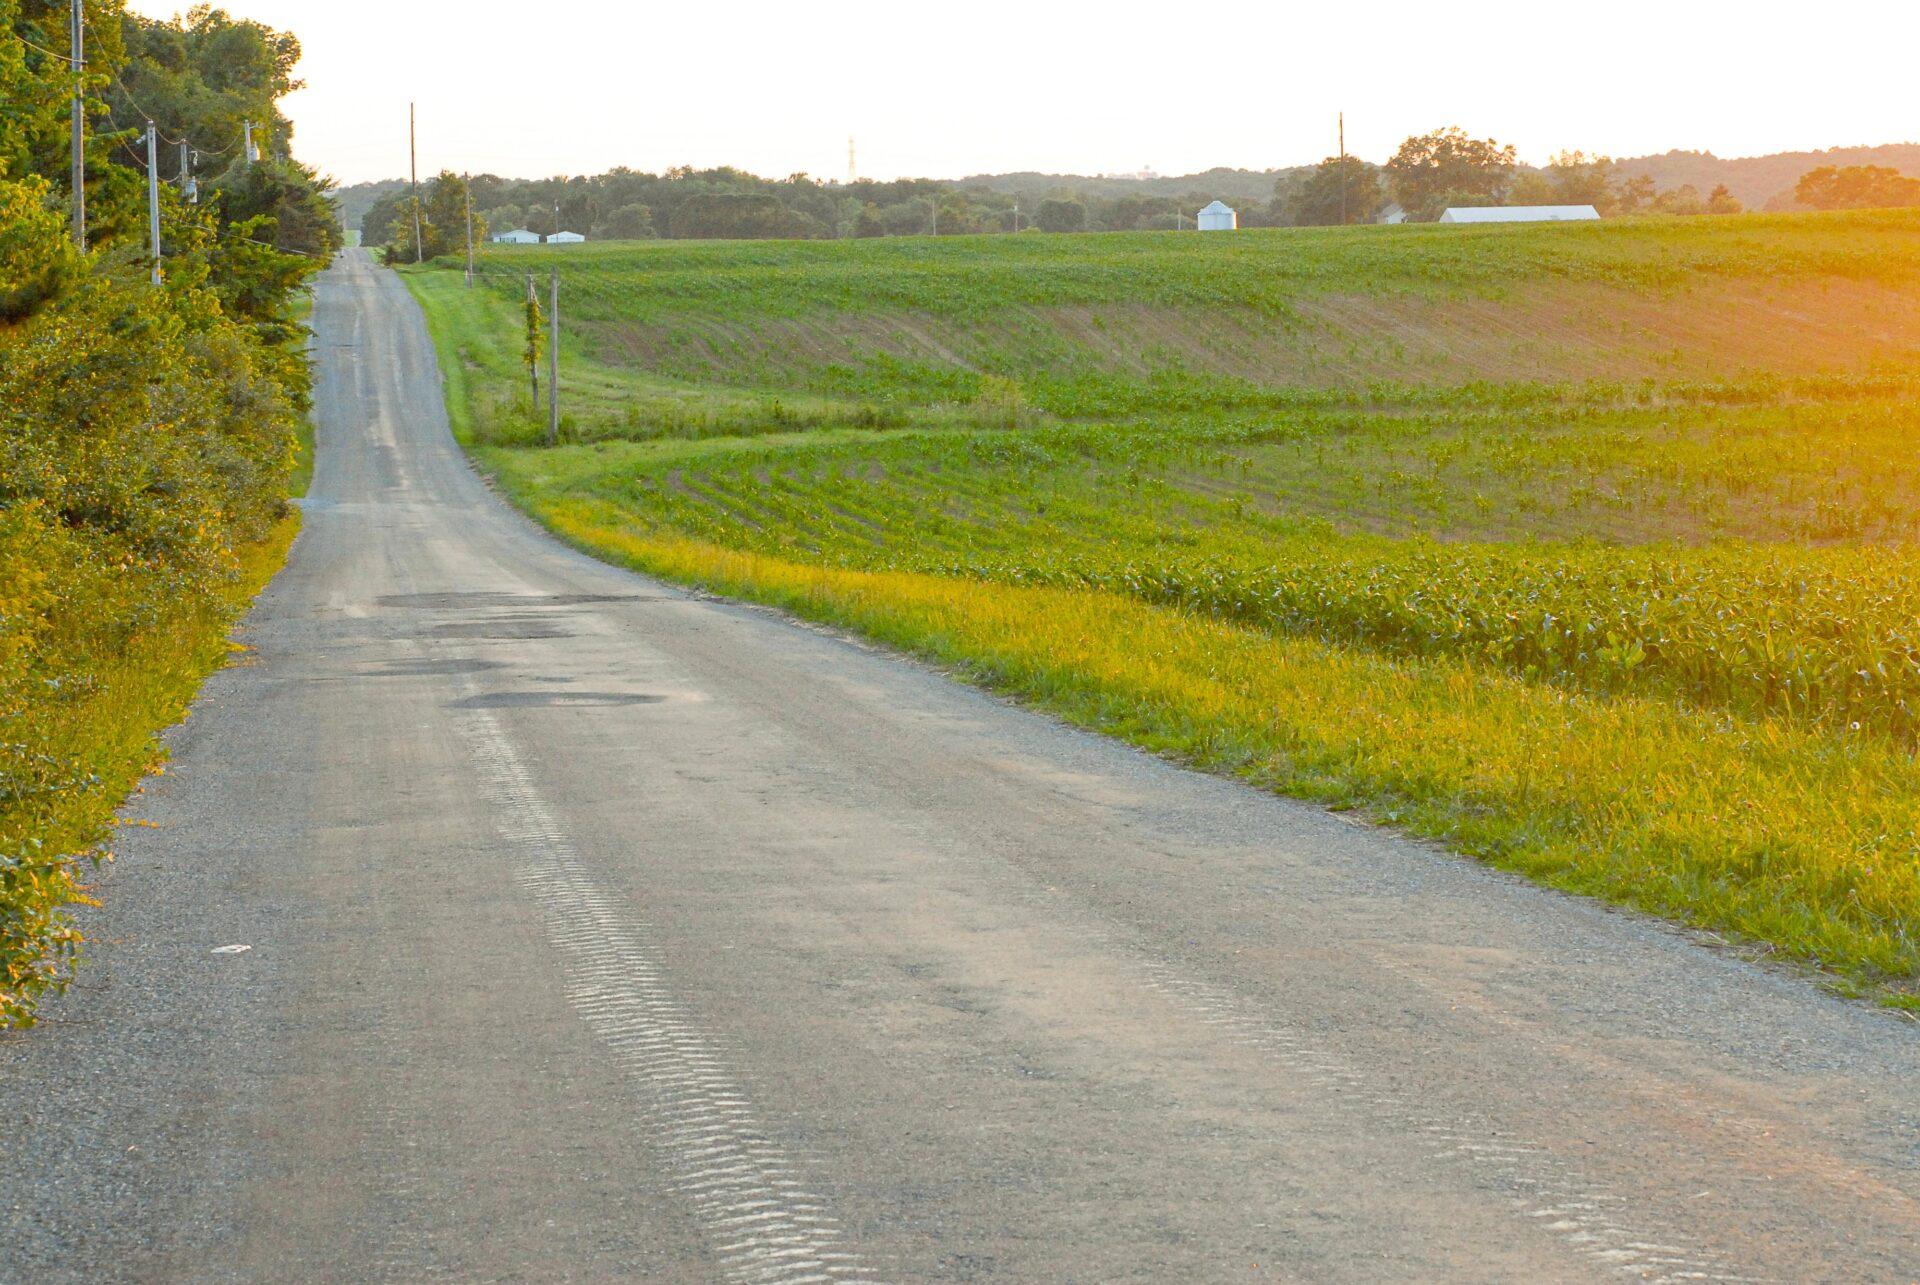 Scratch Gravel Road 6248